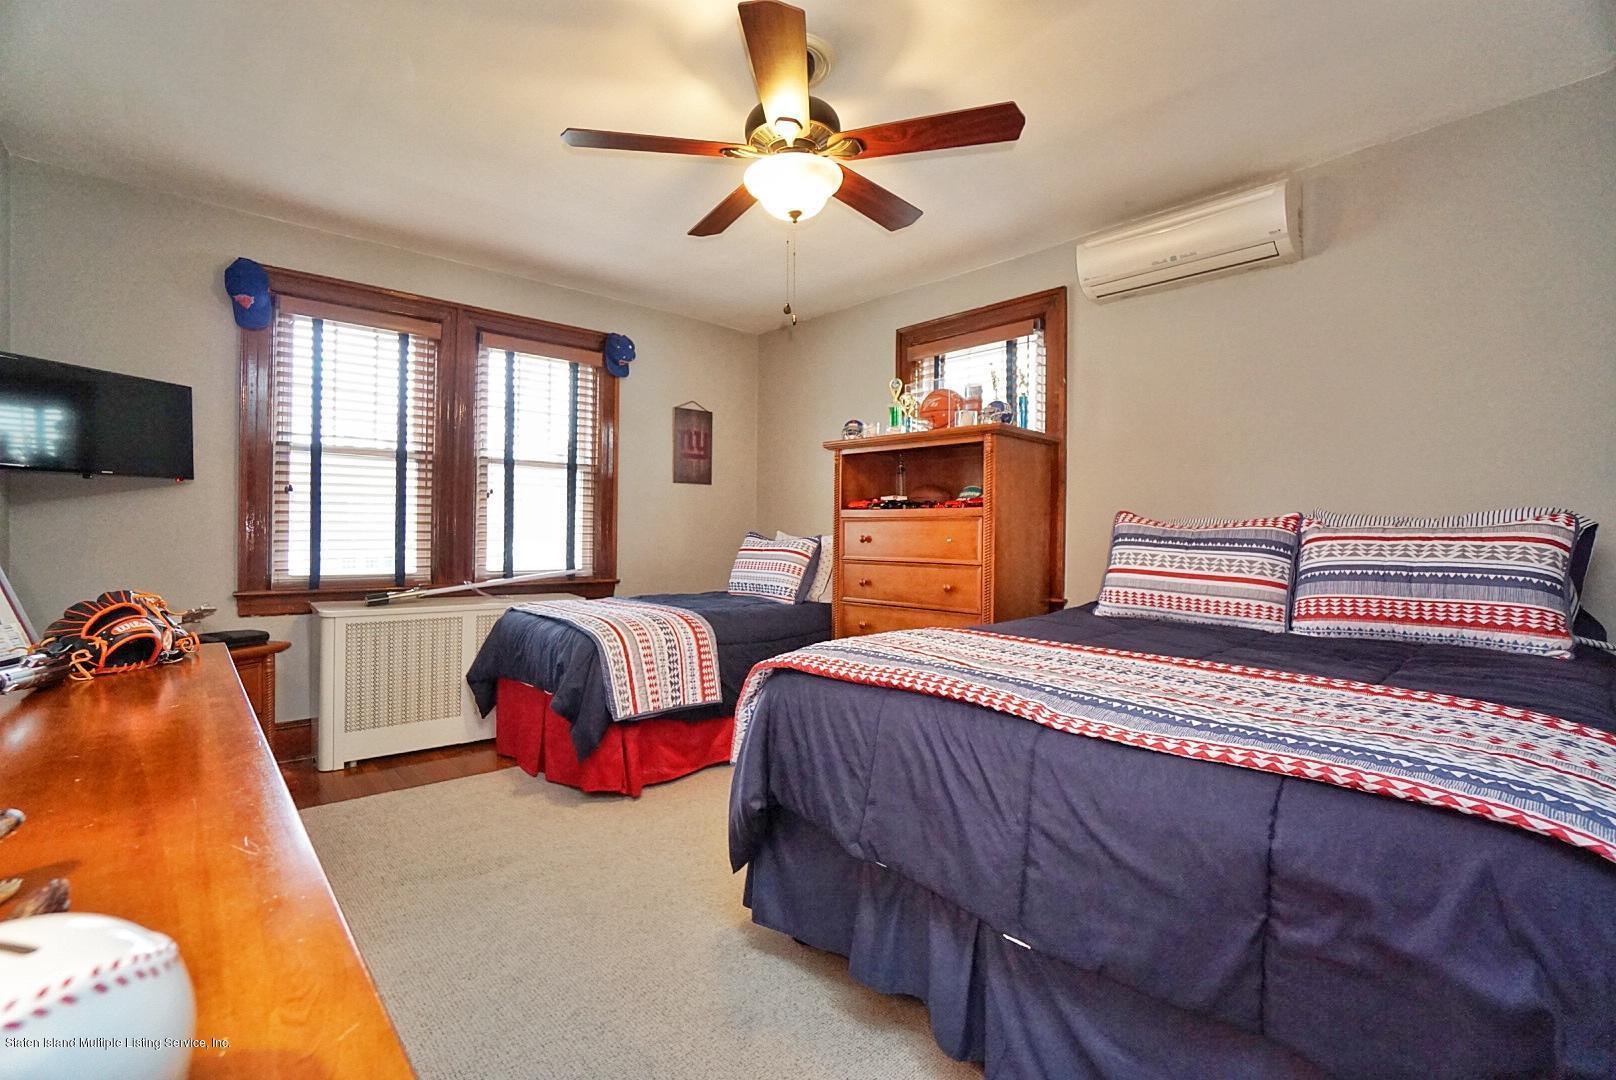 Single Family - Detached 171 Keiber Court  Staten Island, NY 10314, MLS-1127425-41